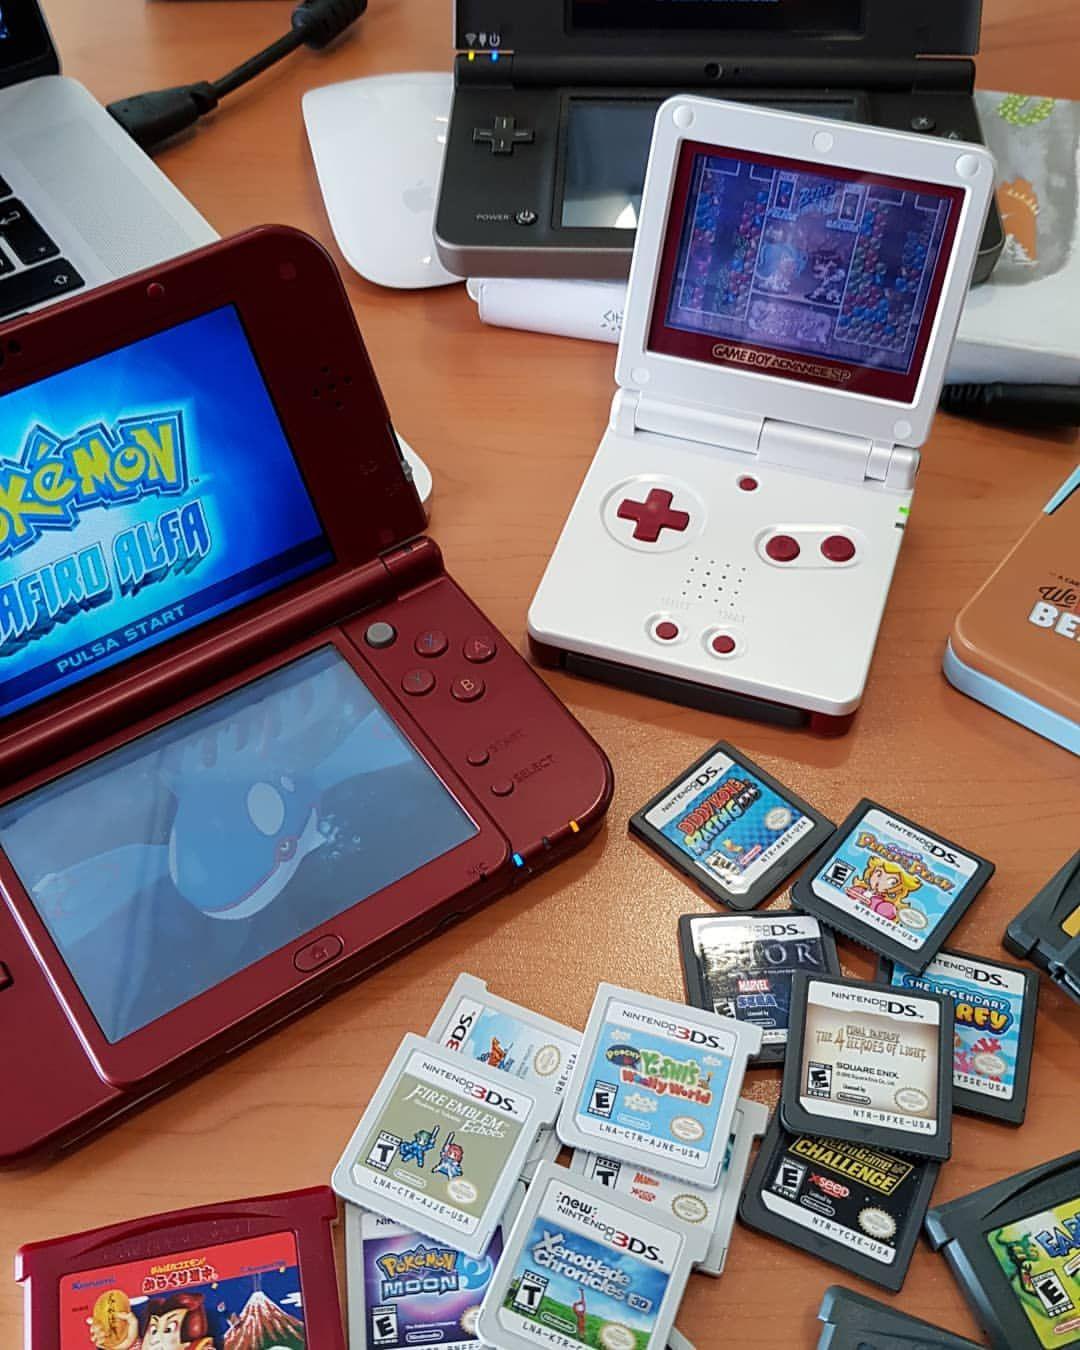 Nintendo 3ds Gameboy Advanced Nintendo3ds Retrocollective Nintendocollect Nintendo 3ds Gameboy Nintendo